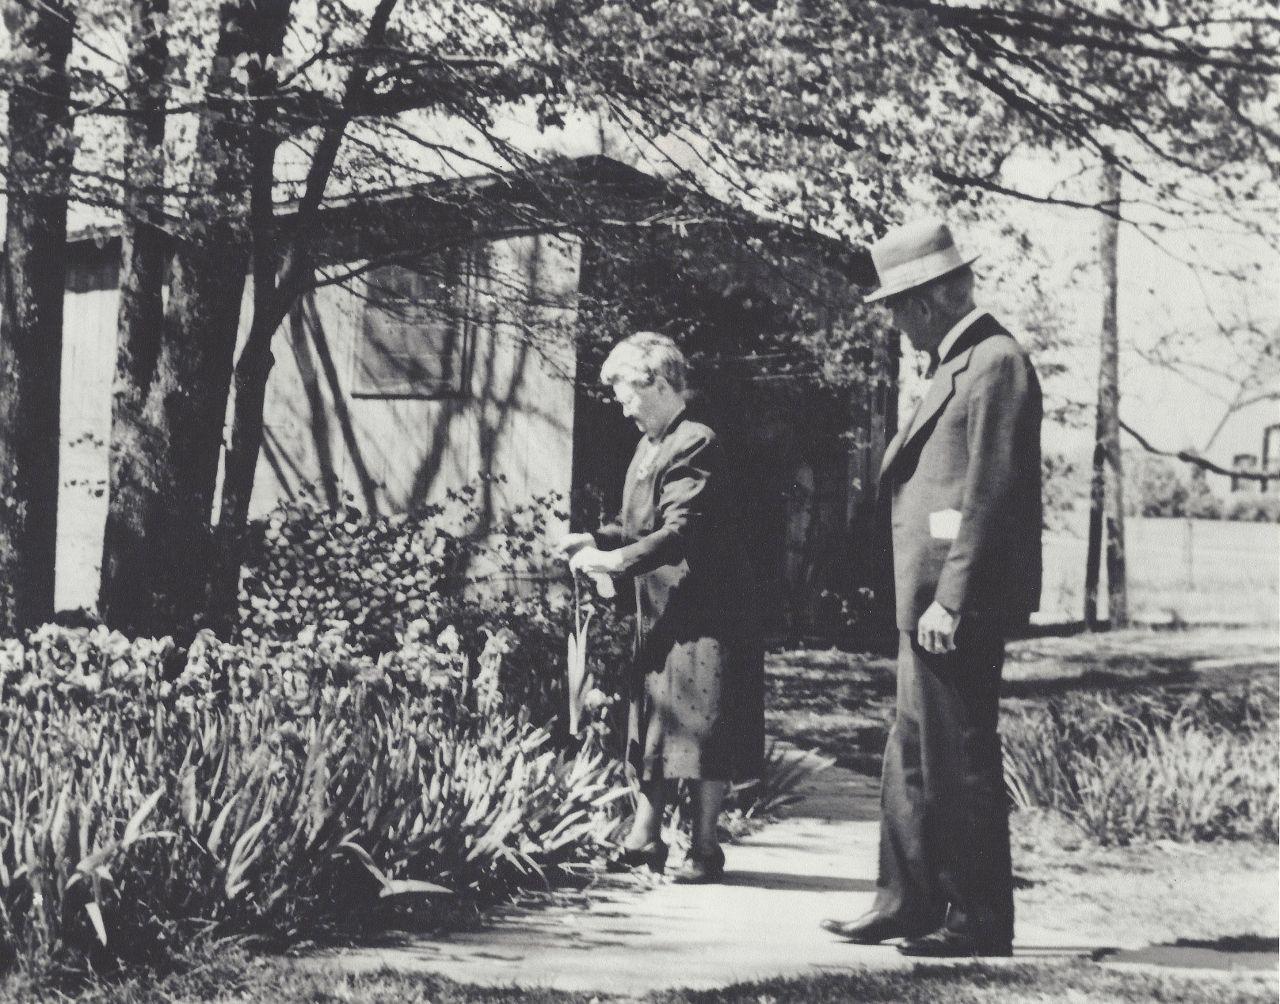 Paul and Mary Pfeiffer in front of barn studio in Piggott, courtesy of Matilda Pfeiffer.